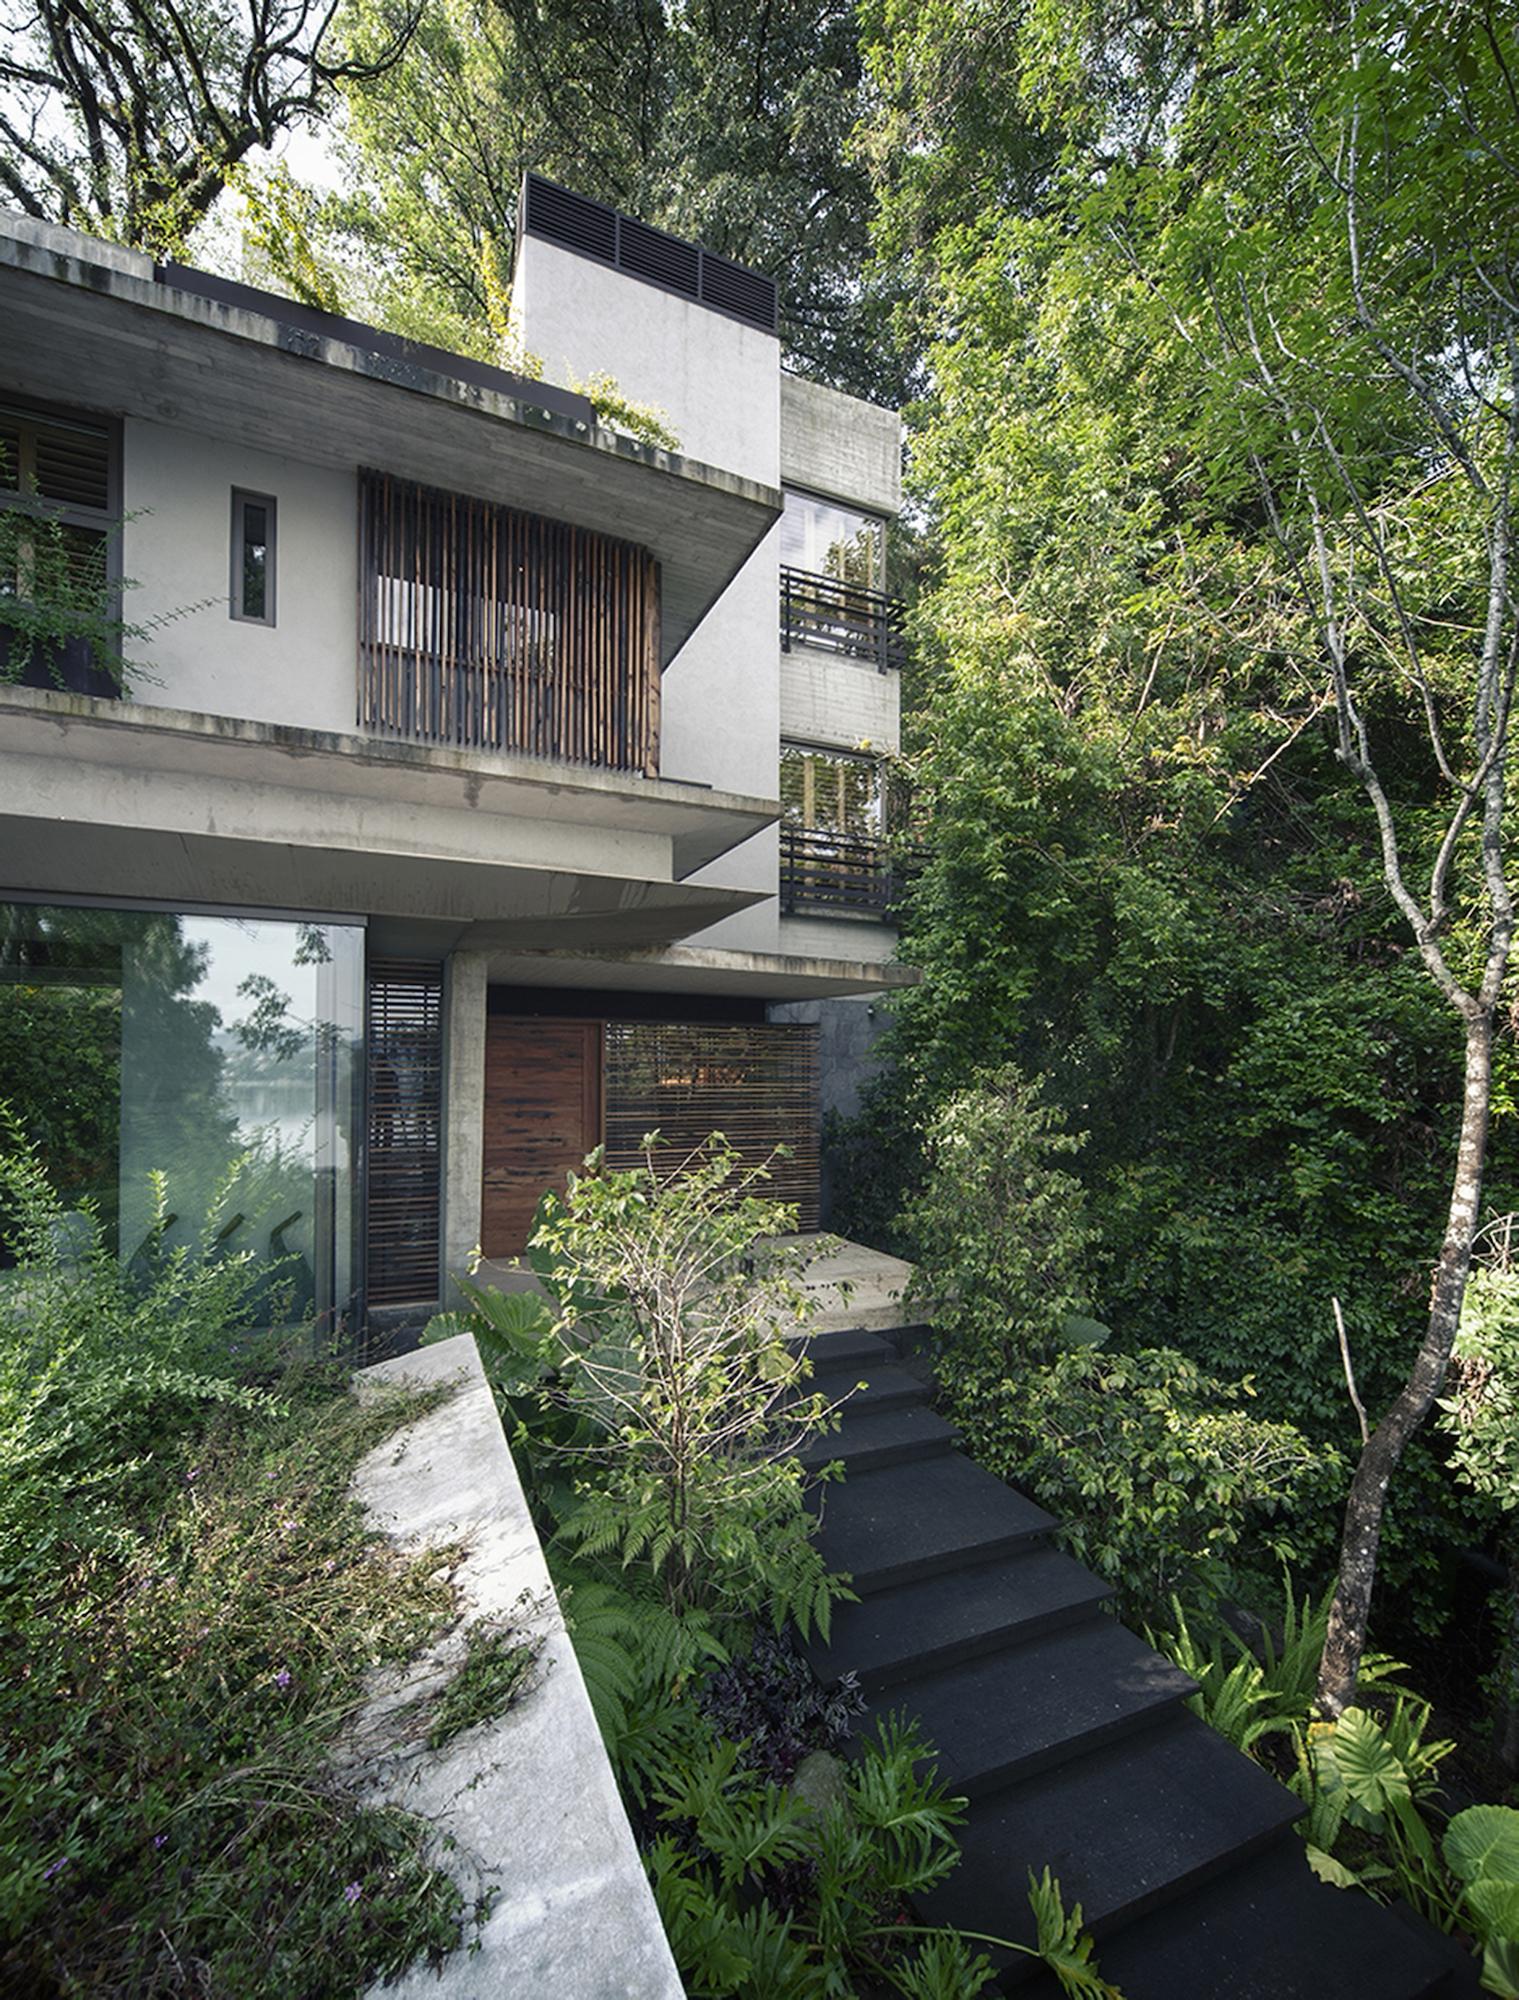 530eb842c07a80ed3b000158_house-maza-chk-arquitectura_2014_02_18_mz_fotos_yoshihiro_2280px_a<br /><br /> ncho_-22-